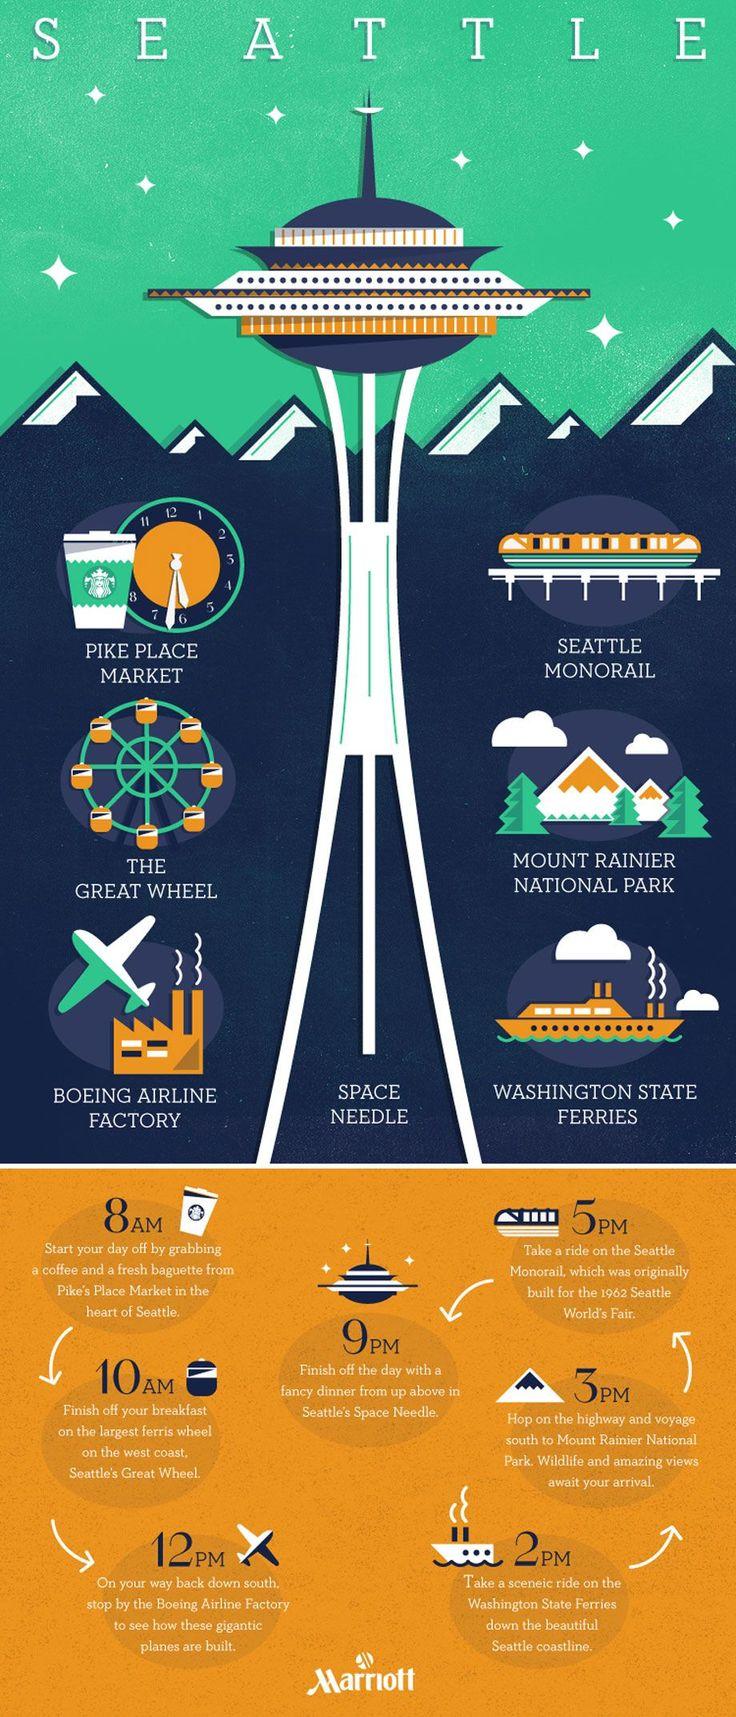 A Seattle Visitoru0027s Guide 432 best Washington